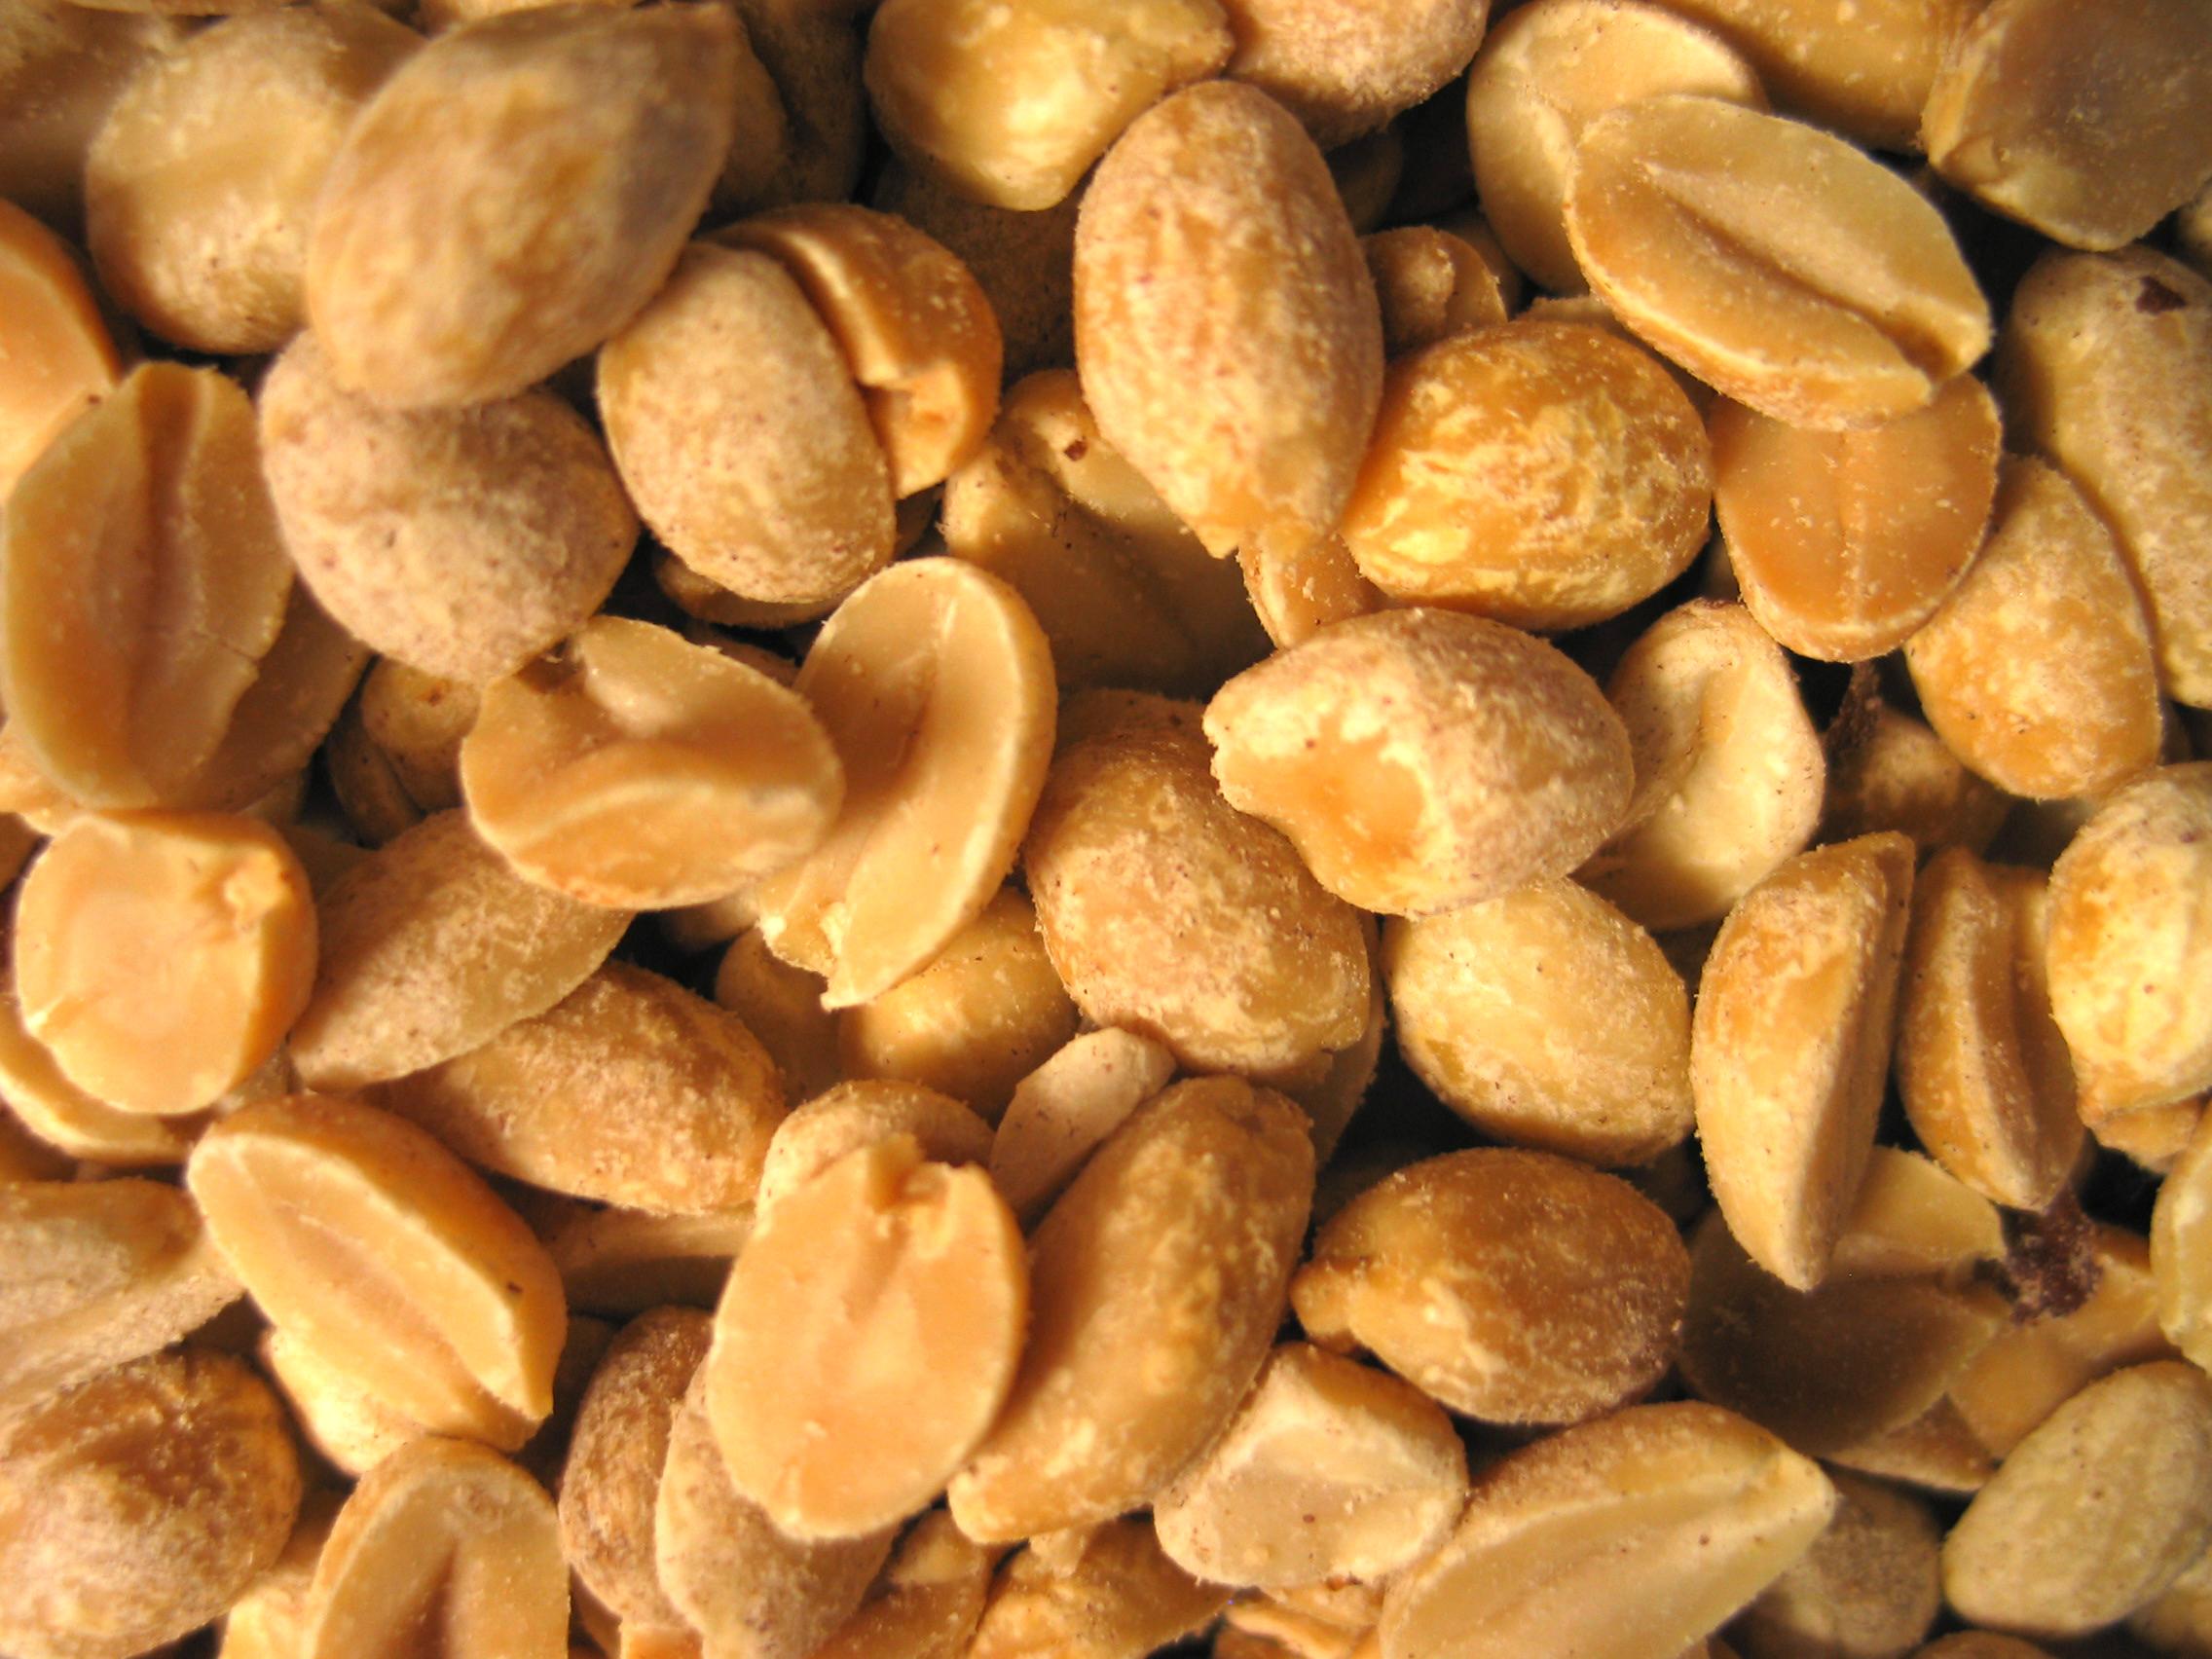 English: Roasted Peanuts author: Flyingdream